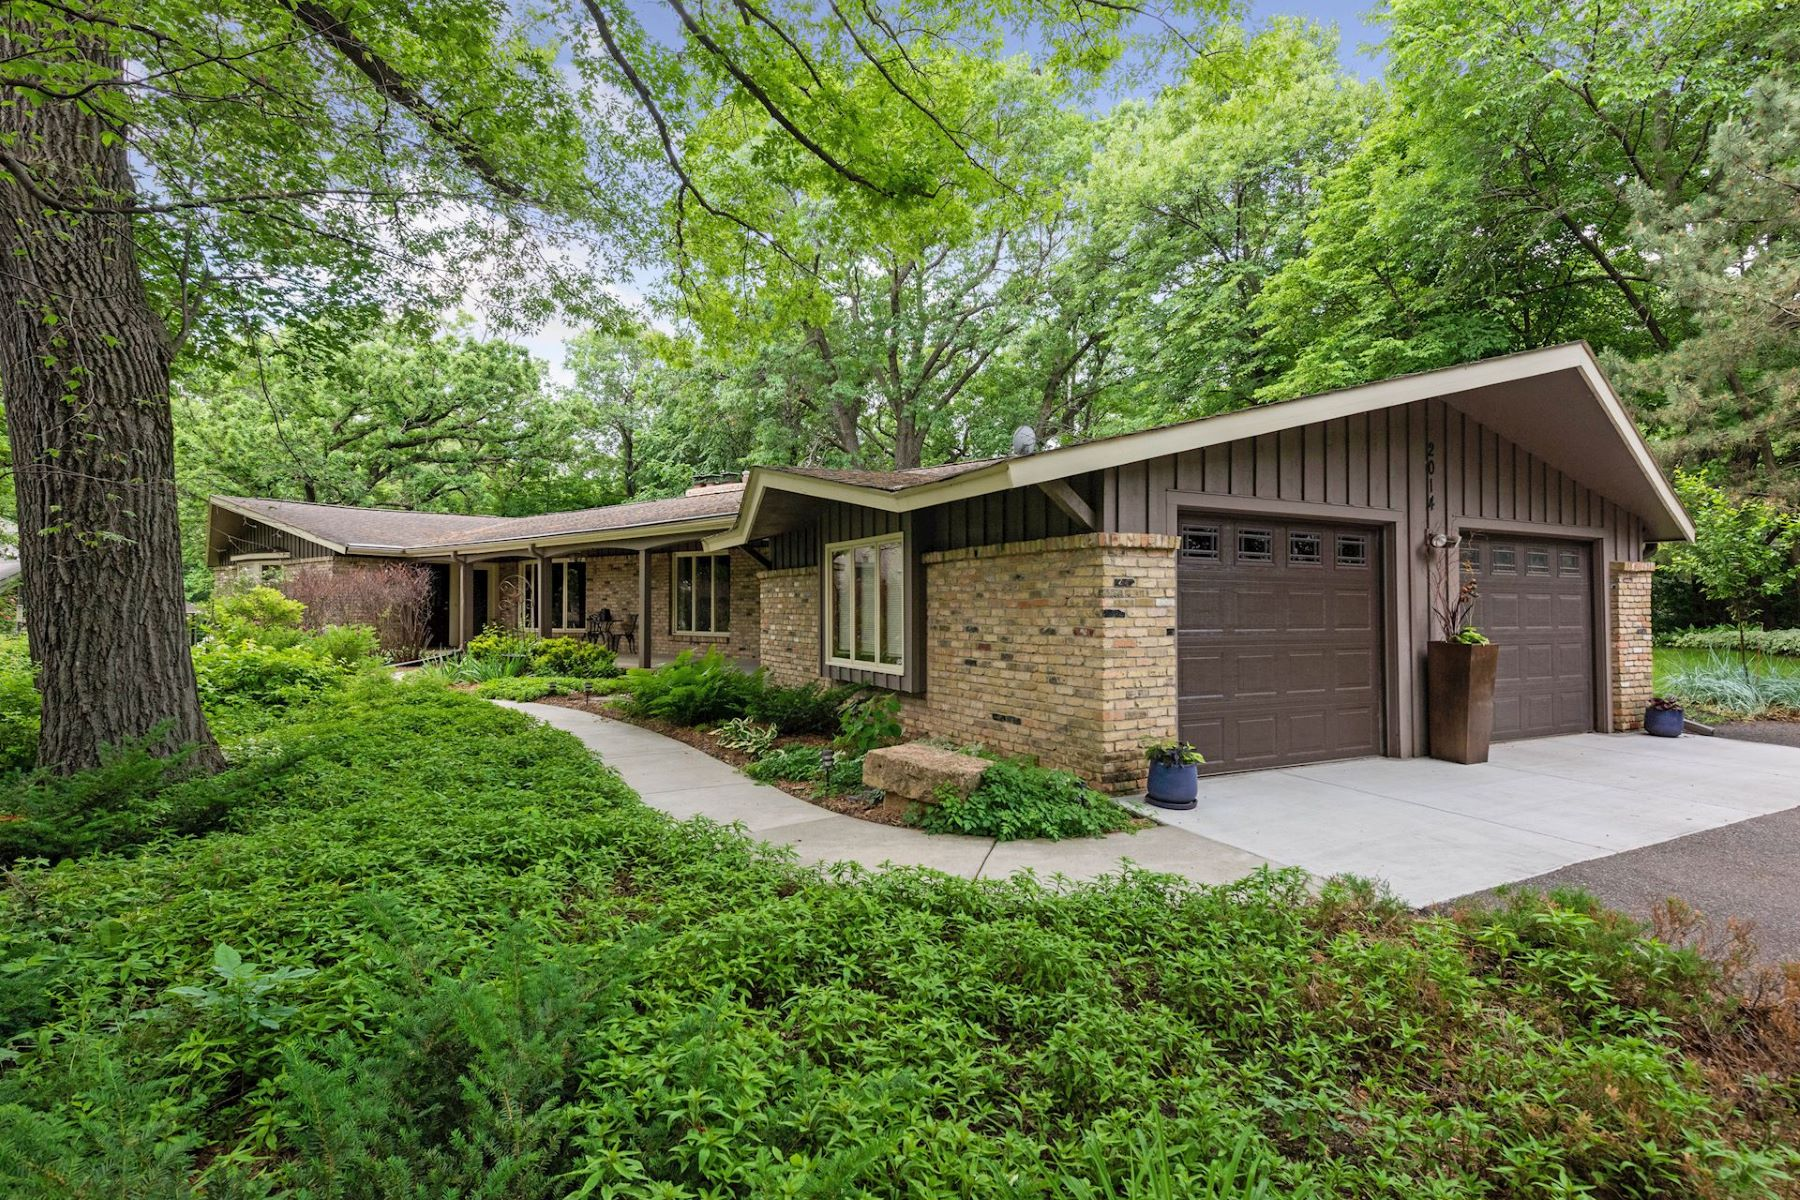 Single Family Homes for Sale at 2014 Oakland Road Minnetonka, Minnesota 55305 United States